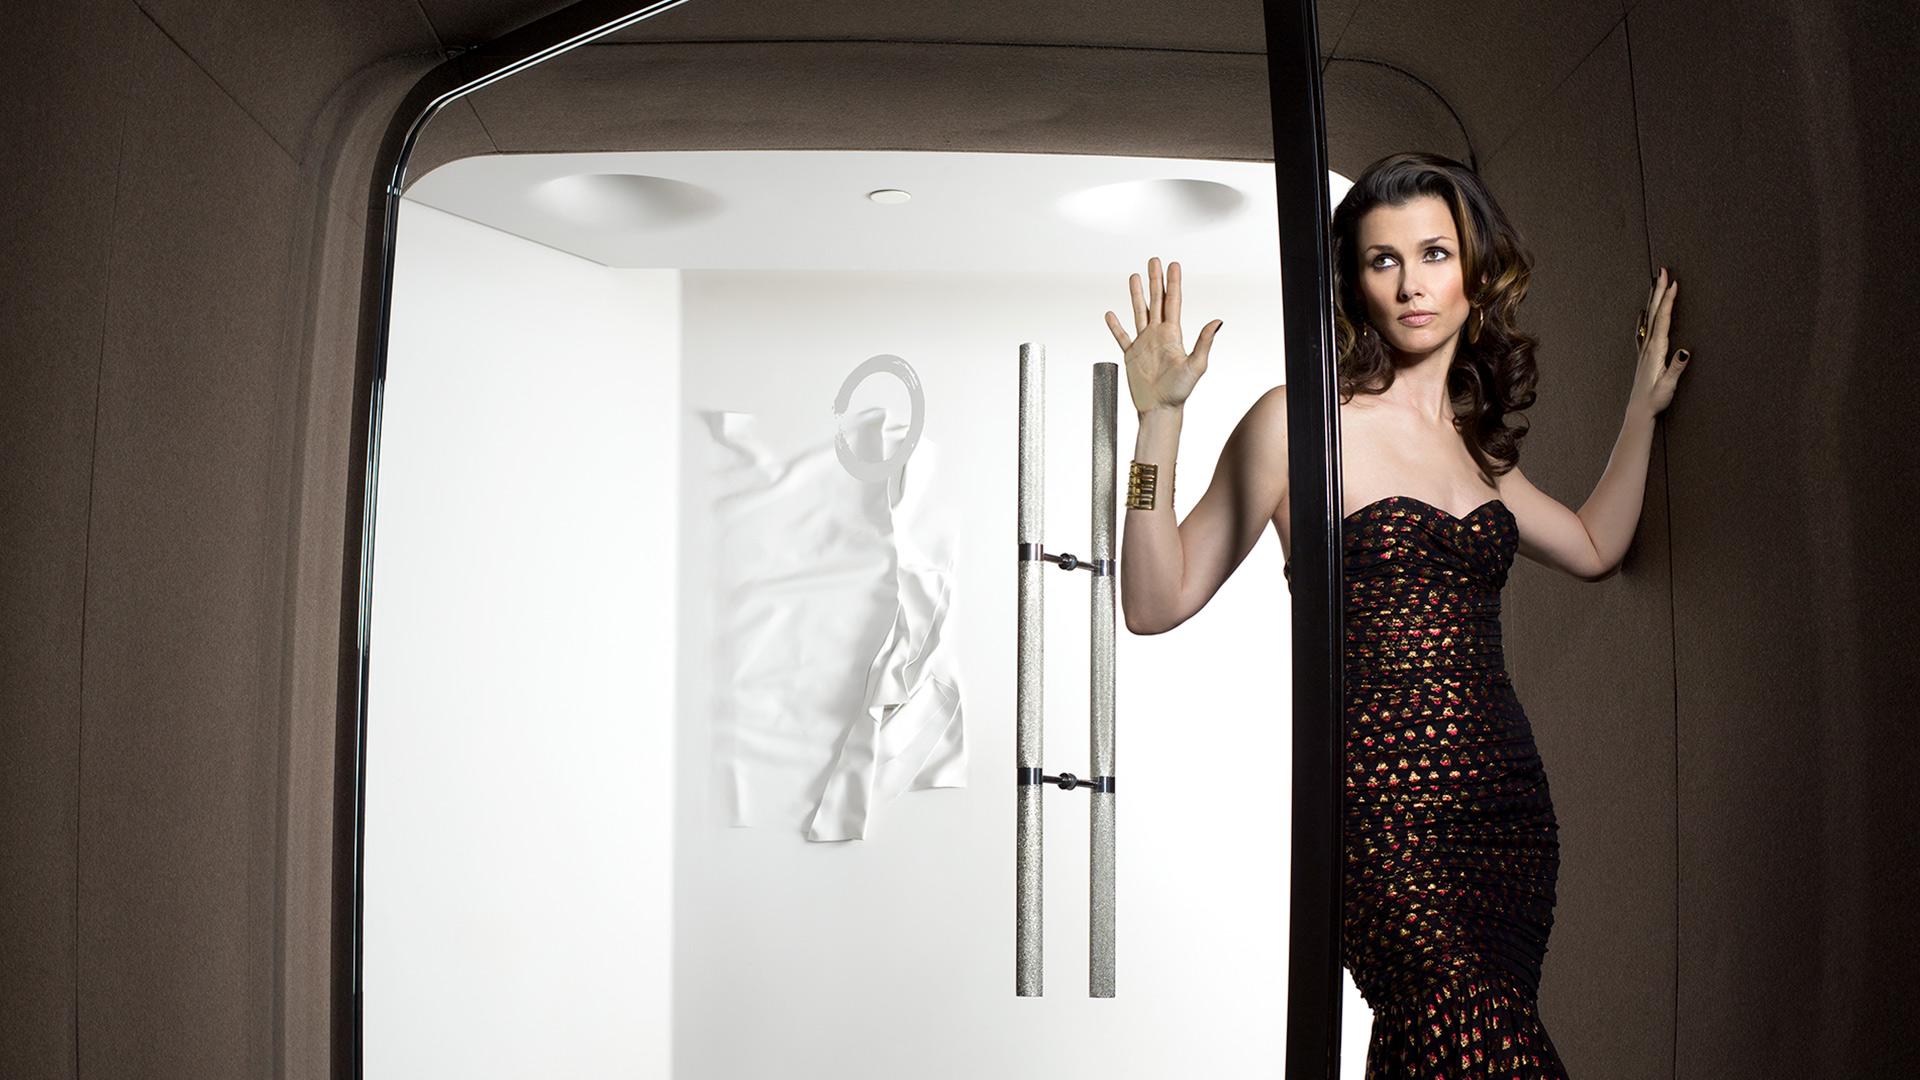 Bridget Moynahan emerges from an elegant restaurant in Paris